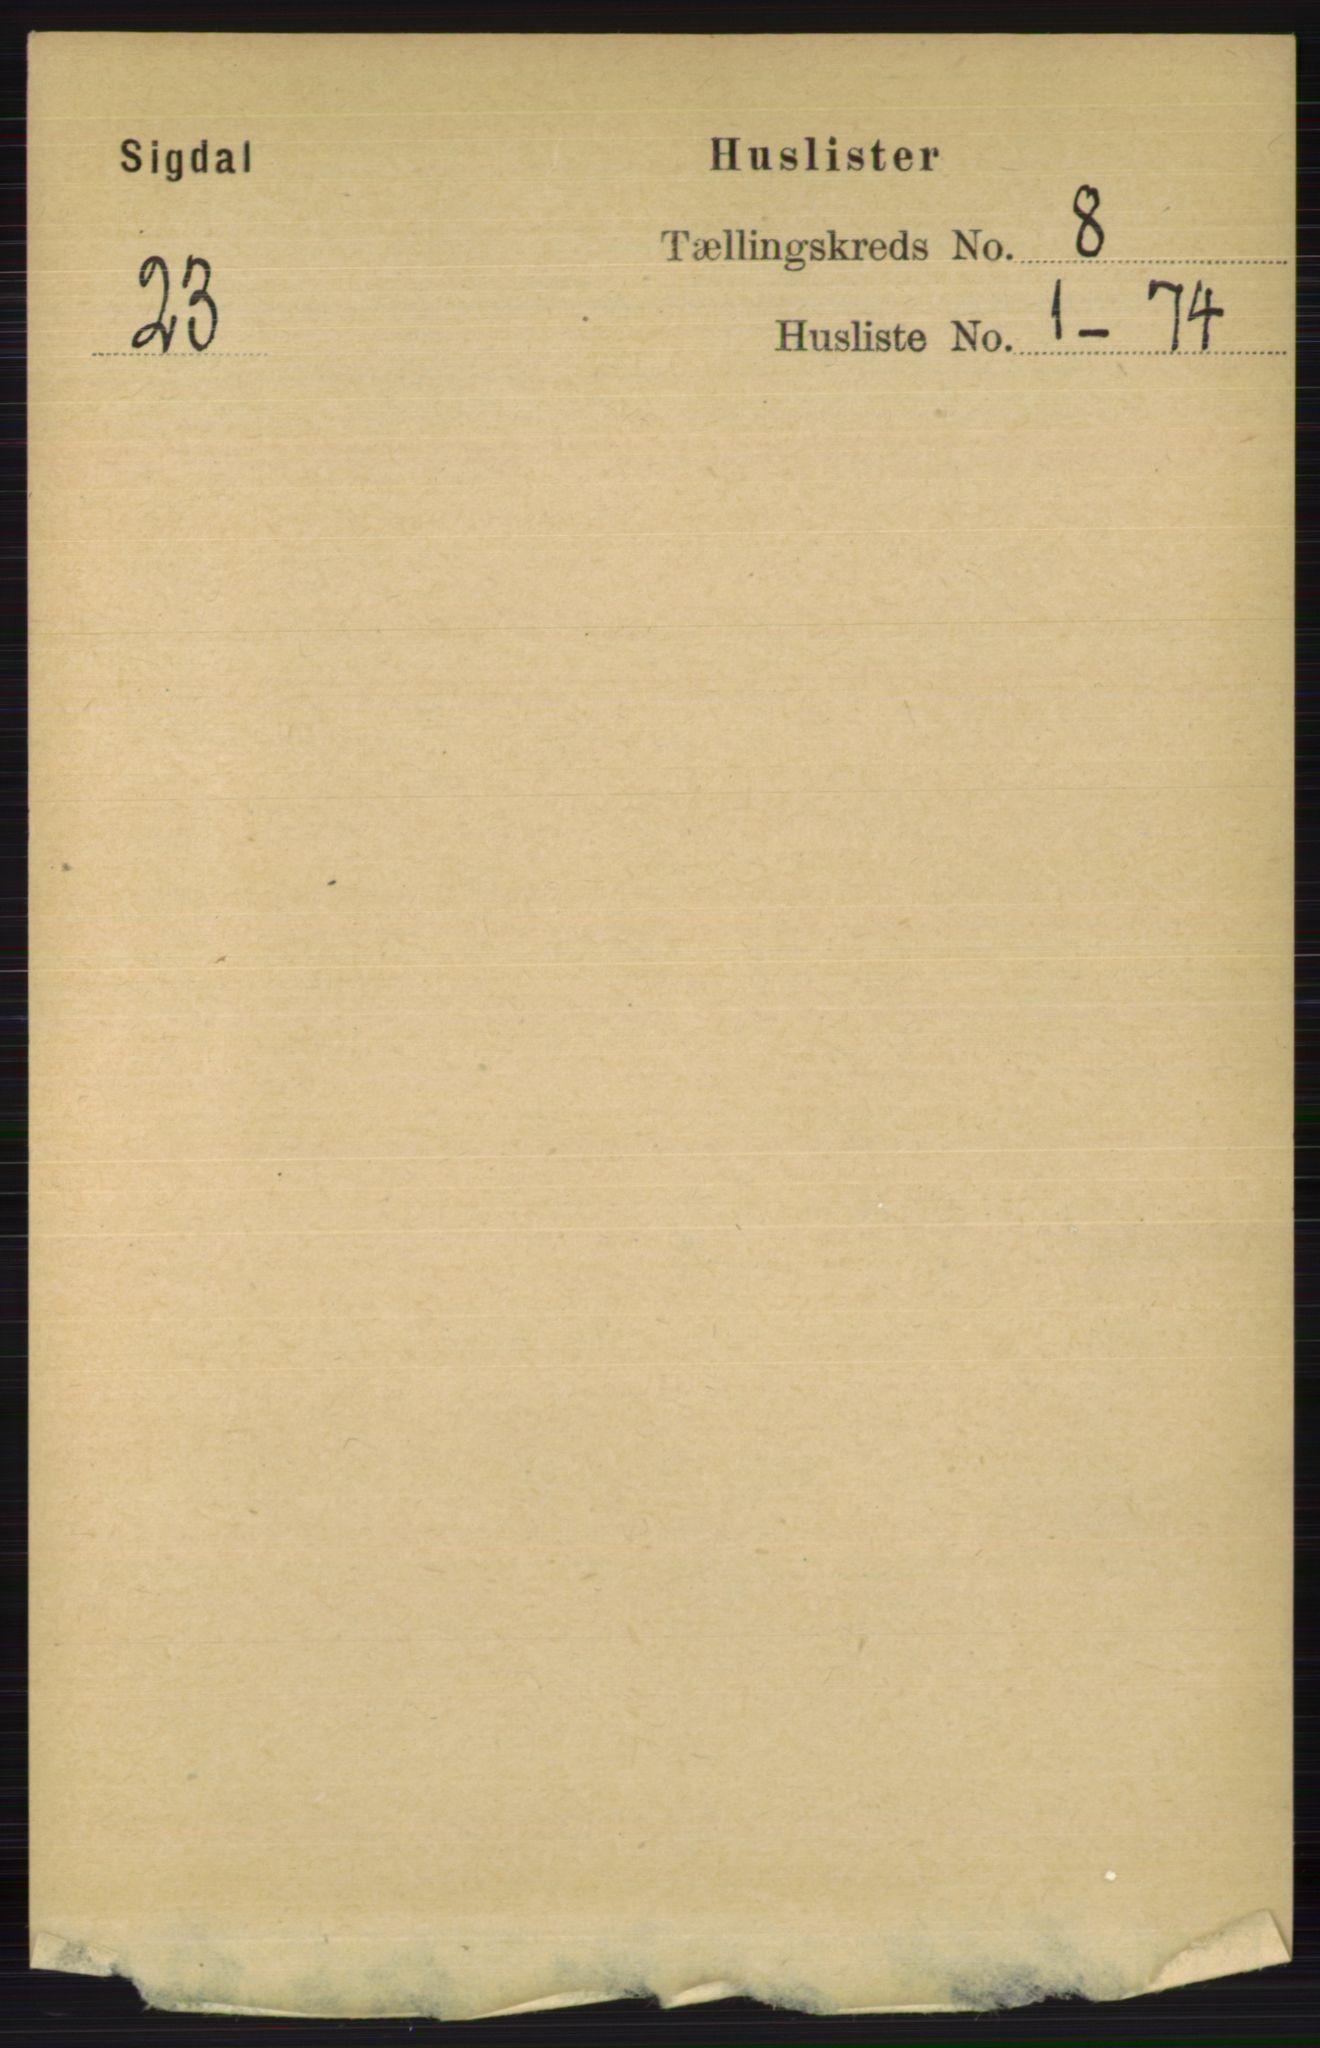 RA, Folketelling 1891 for 0621 Sigdal herred, 1891, s. 3100